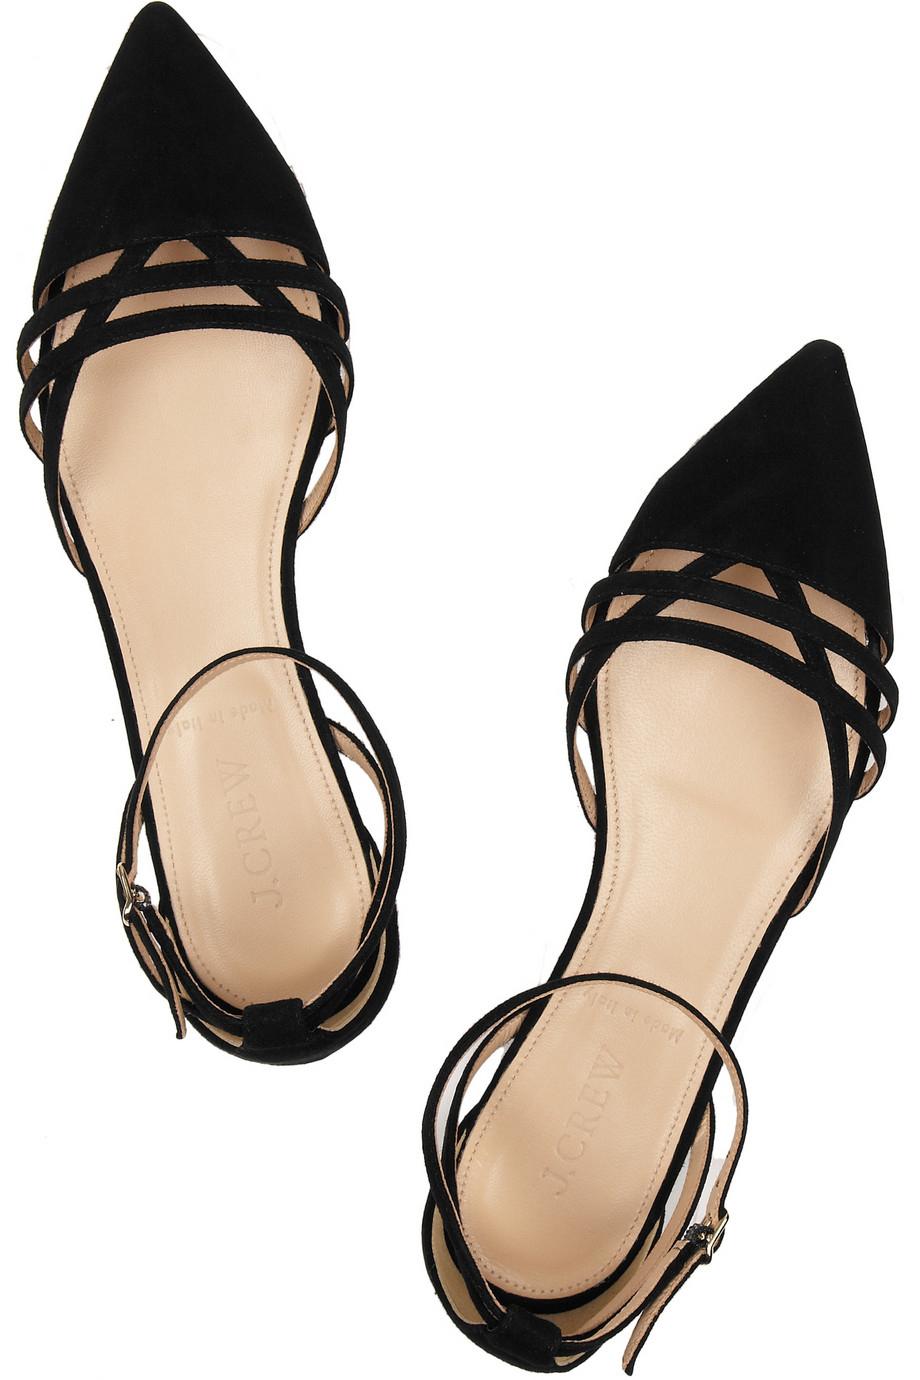 Large Ladies Black Flat Shoes